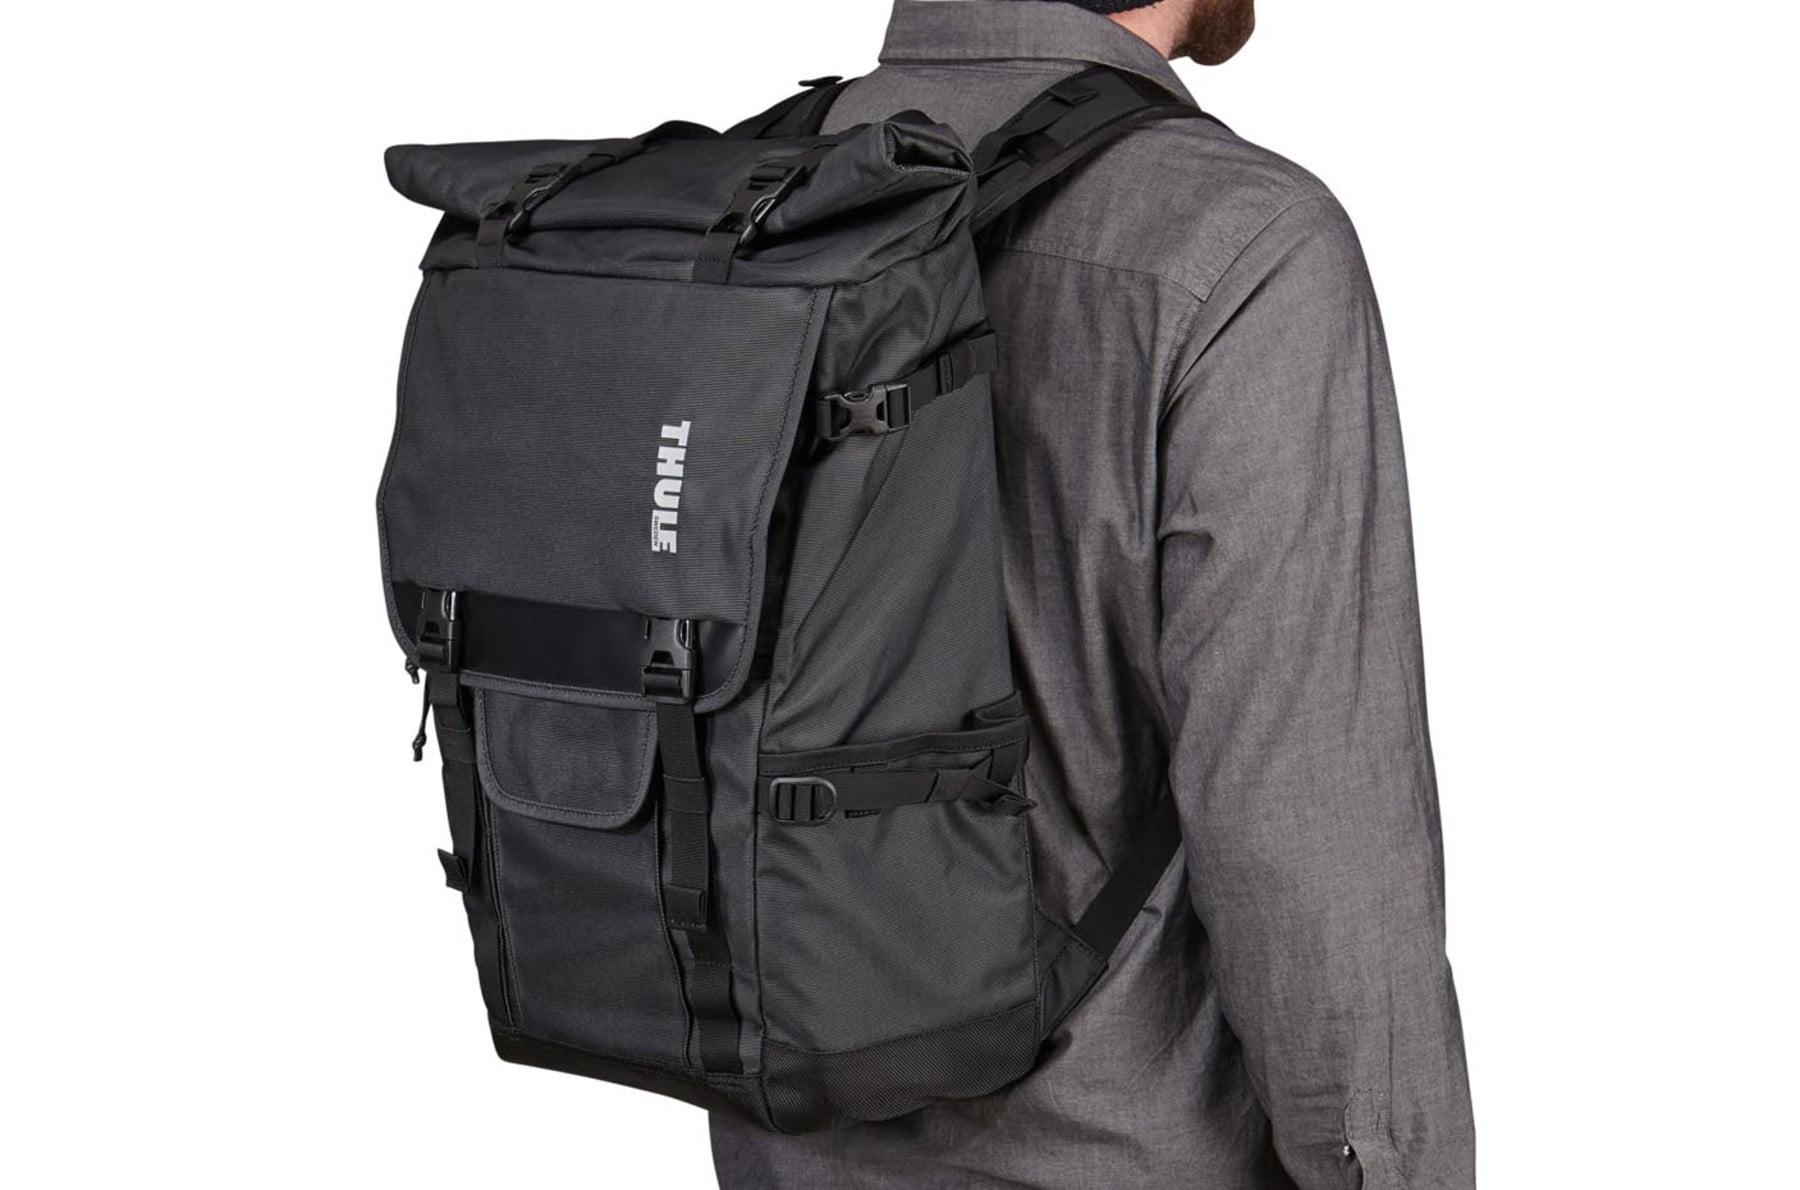 Rucsac foto Thule Covert DSLR Backpack Dark Shadow 2